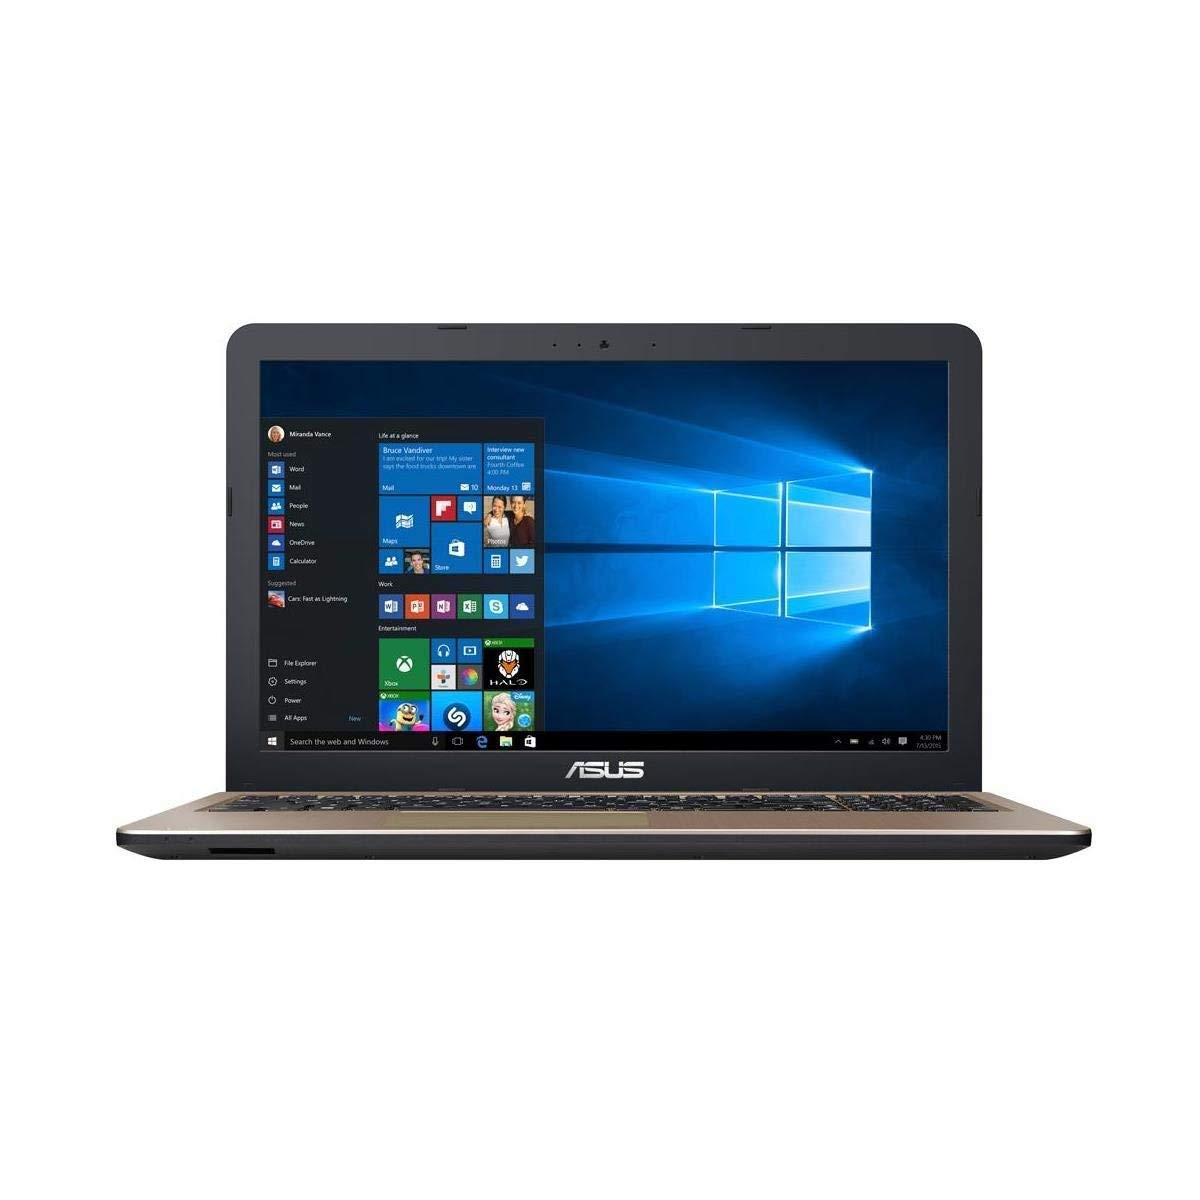 ASUS VivoBook x540ma-gq024 Negro Ordenador portátil 1366 X ...